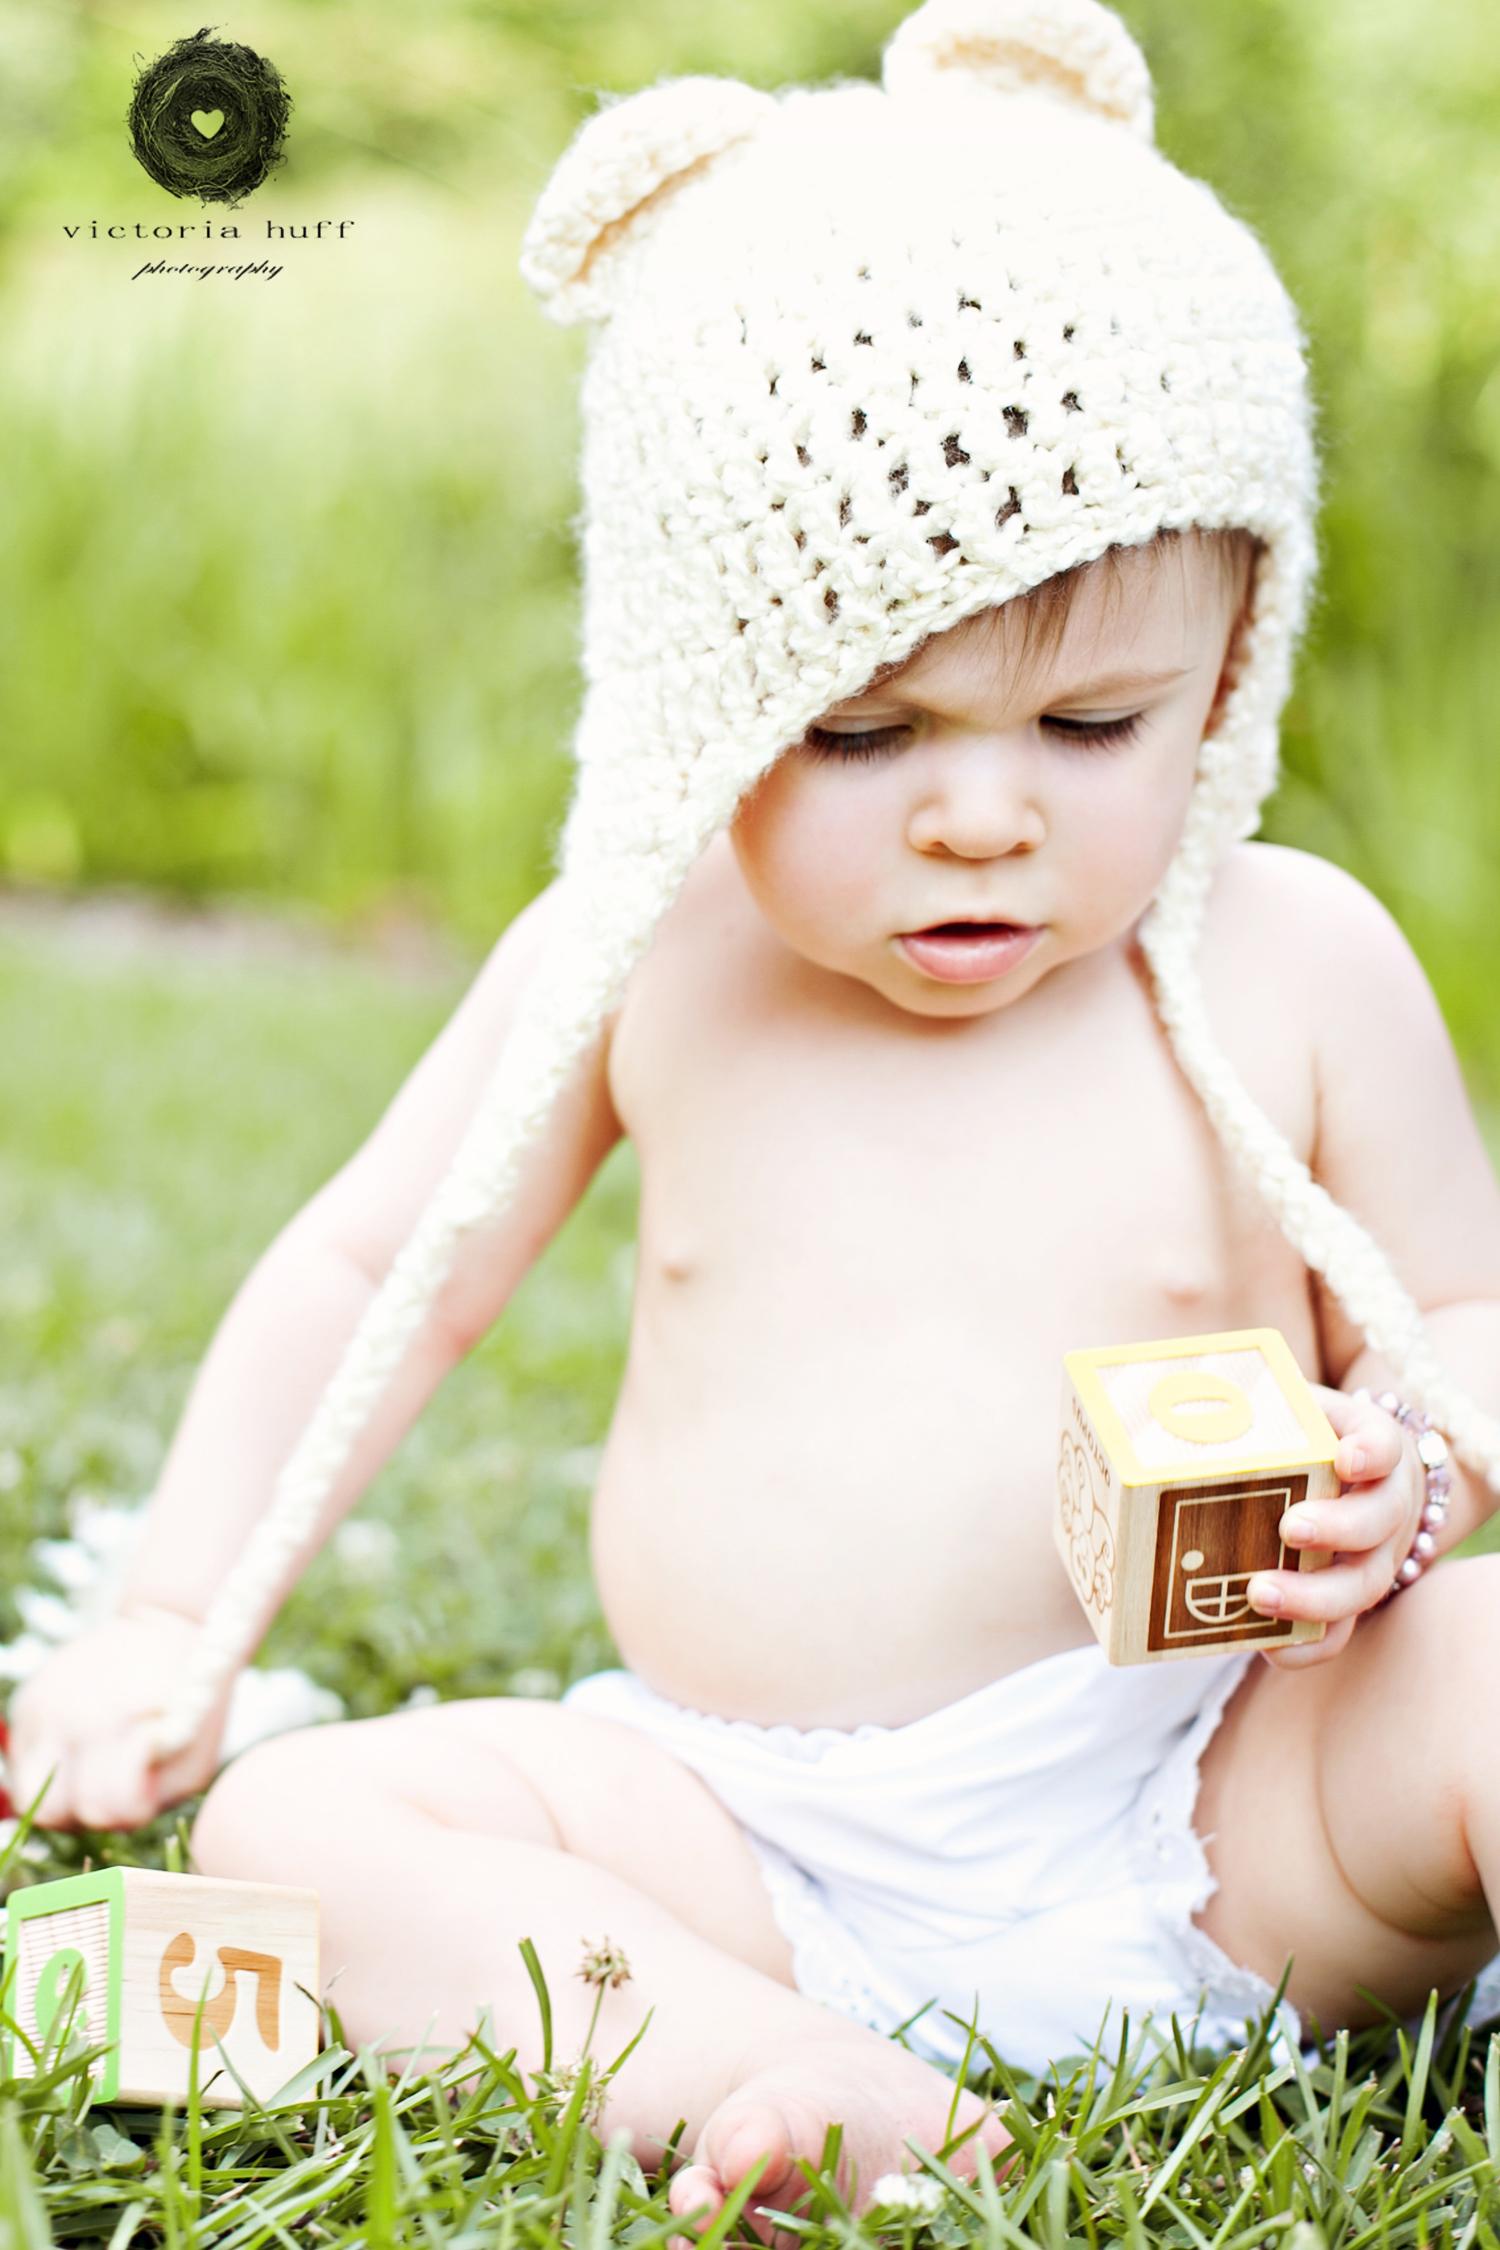 Callie-toddler-baby-one-year-shoot-hat-botanical-gardens-athens-georgia-photography-1.jpg